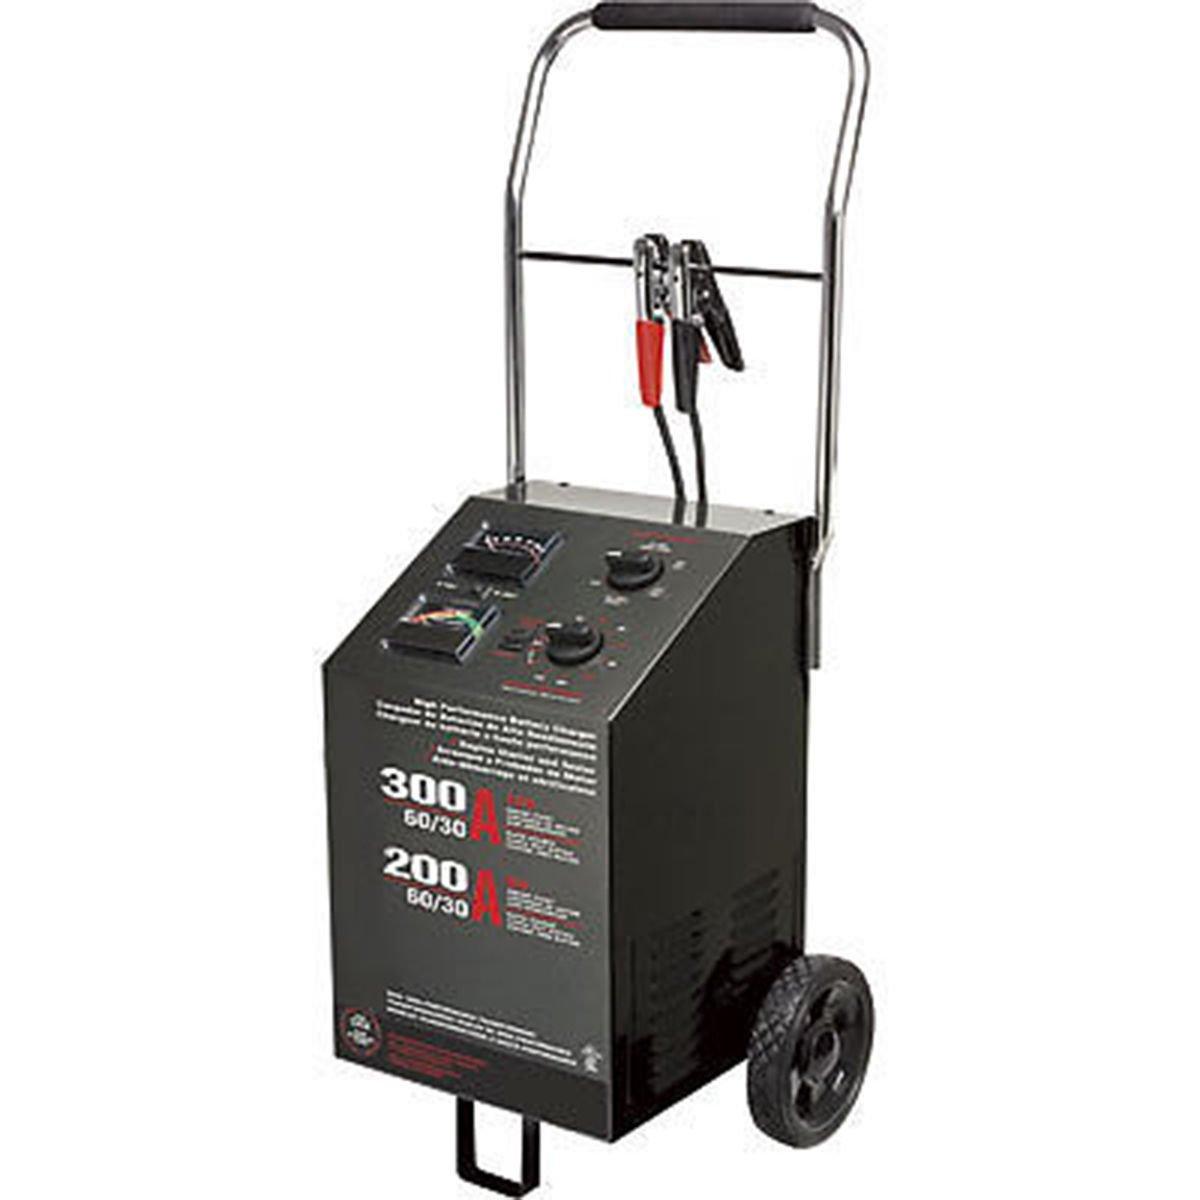 Battery Charger Starter Commercial - Portable - 300 Amp - 6V & 12V Batteries